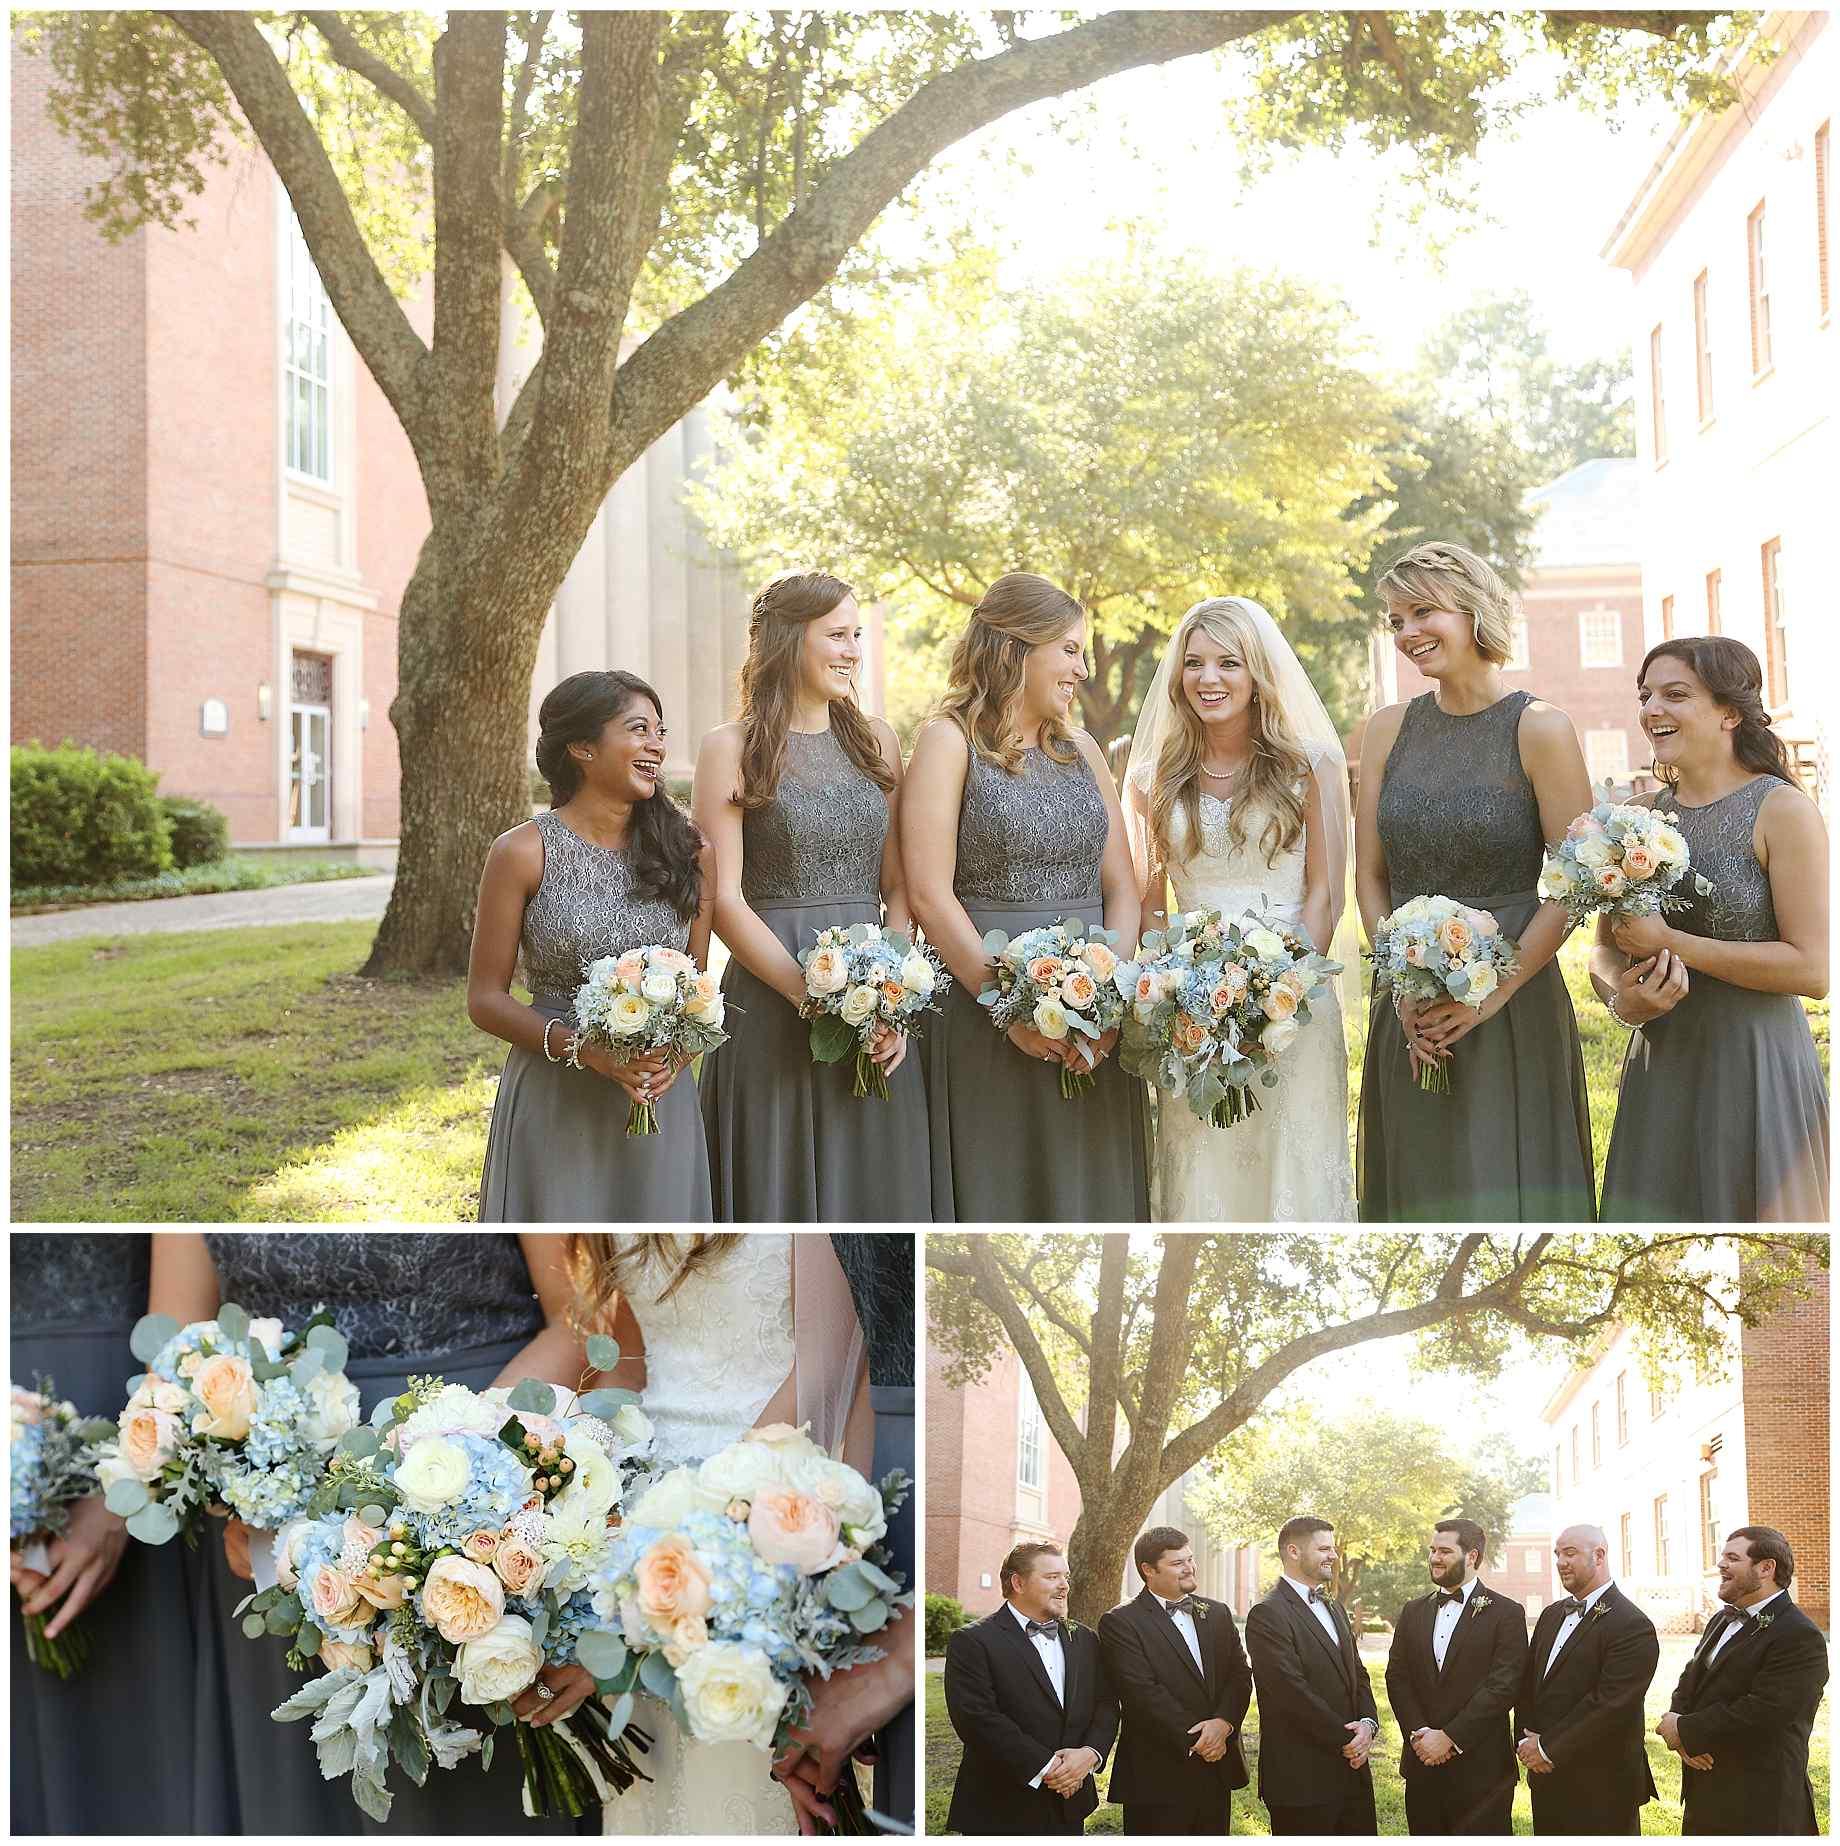 centenary-college-wedding-photos-shreveport-008